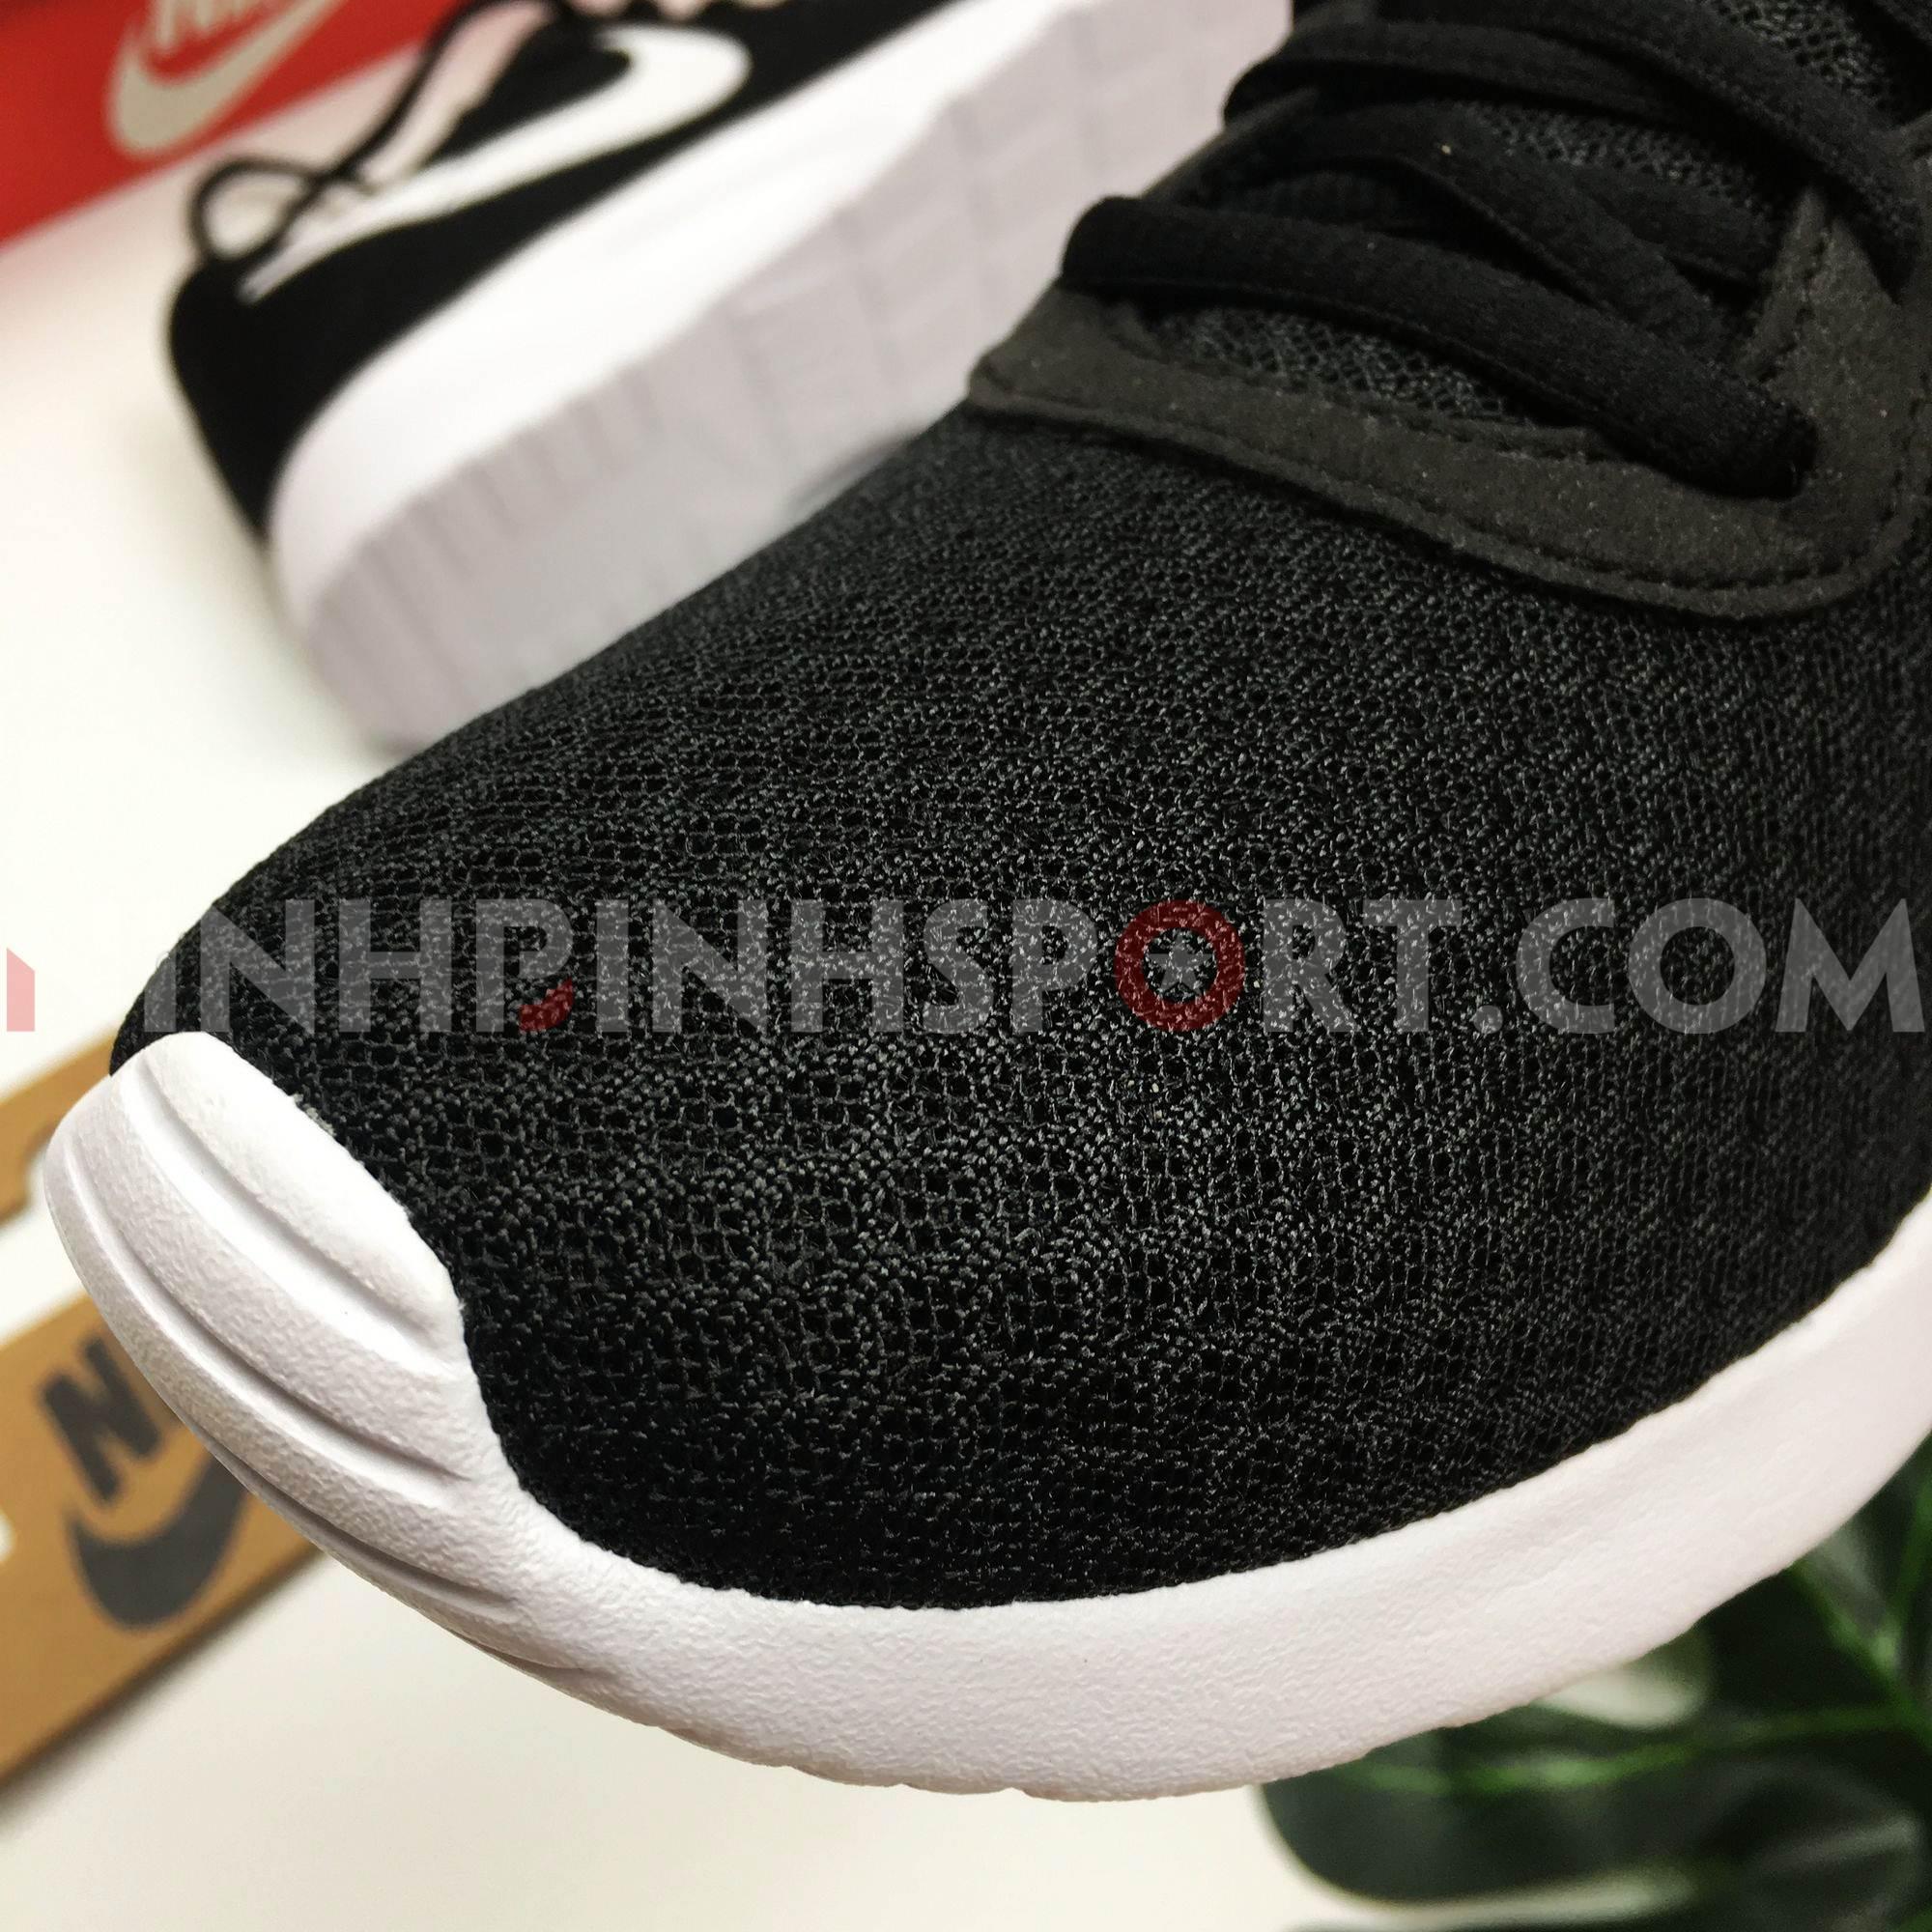 Giày thể thao nữ Nike Tanjun Black 812655-011